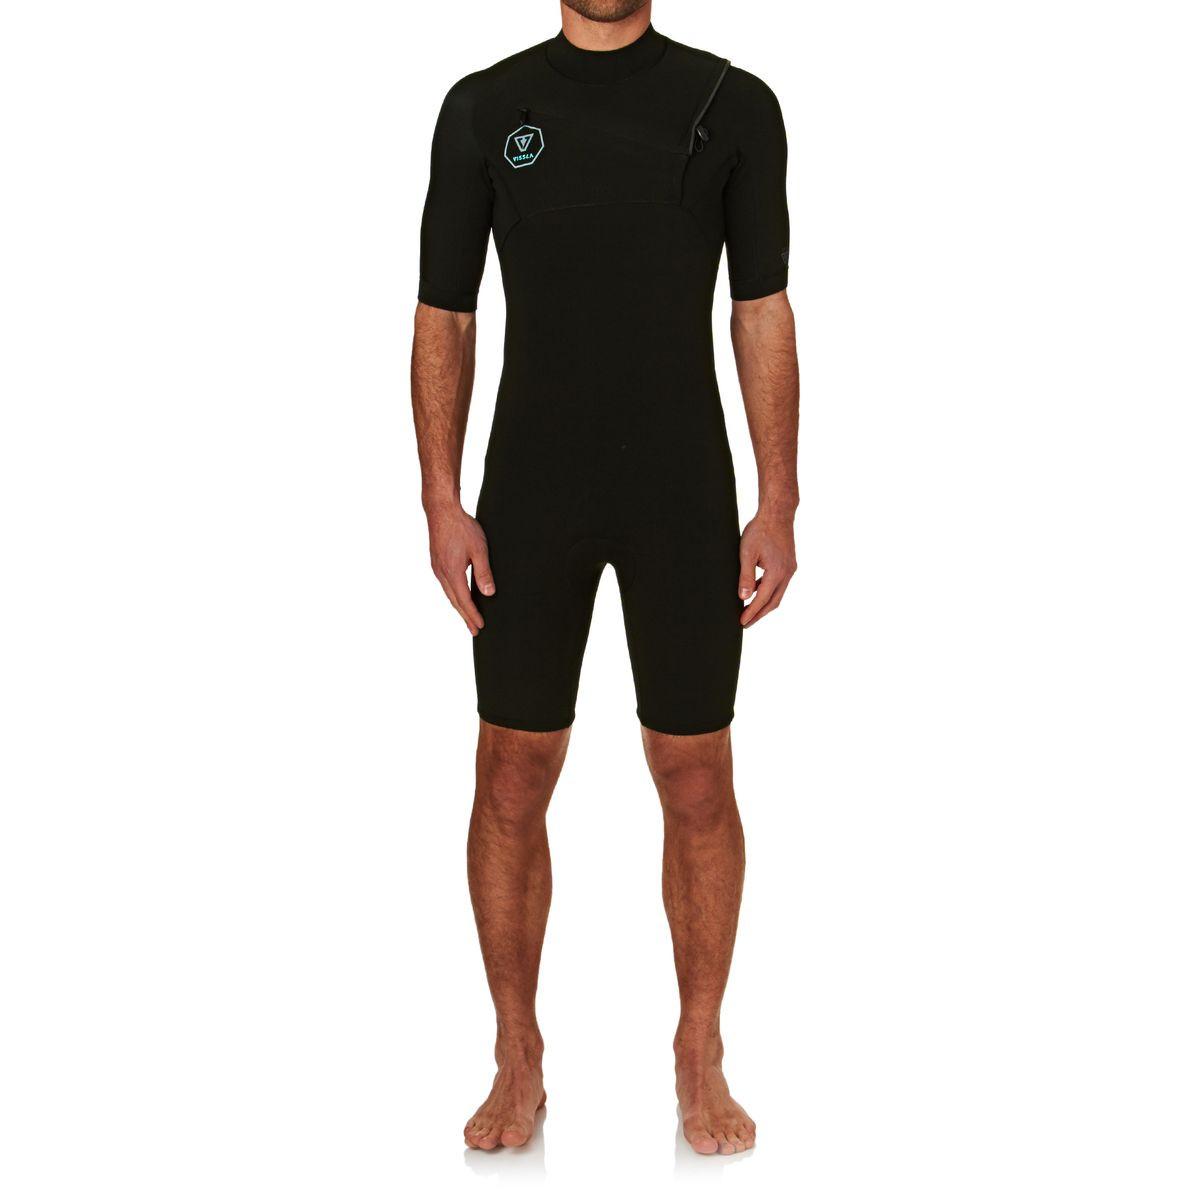 Vissla 7 Seas 2/2mm Chest Zip Shorty Wetsuit - Black